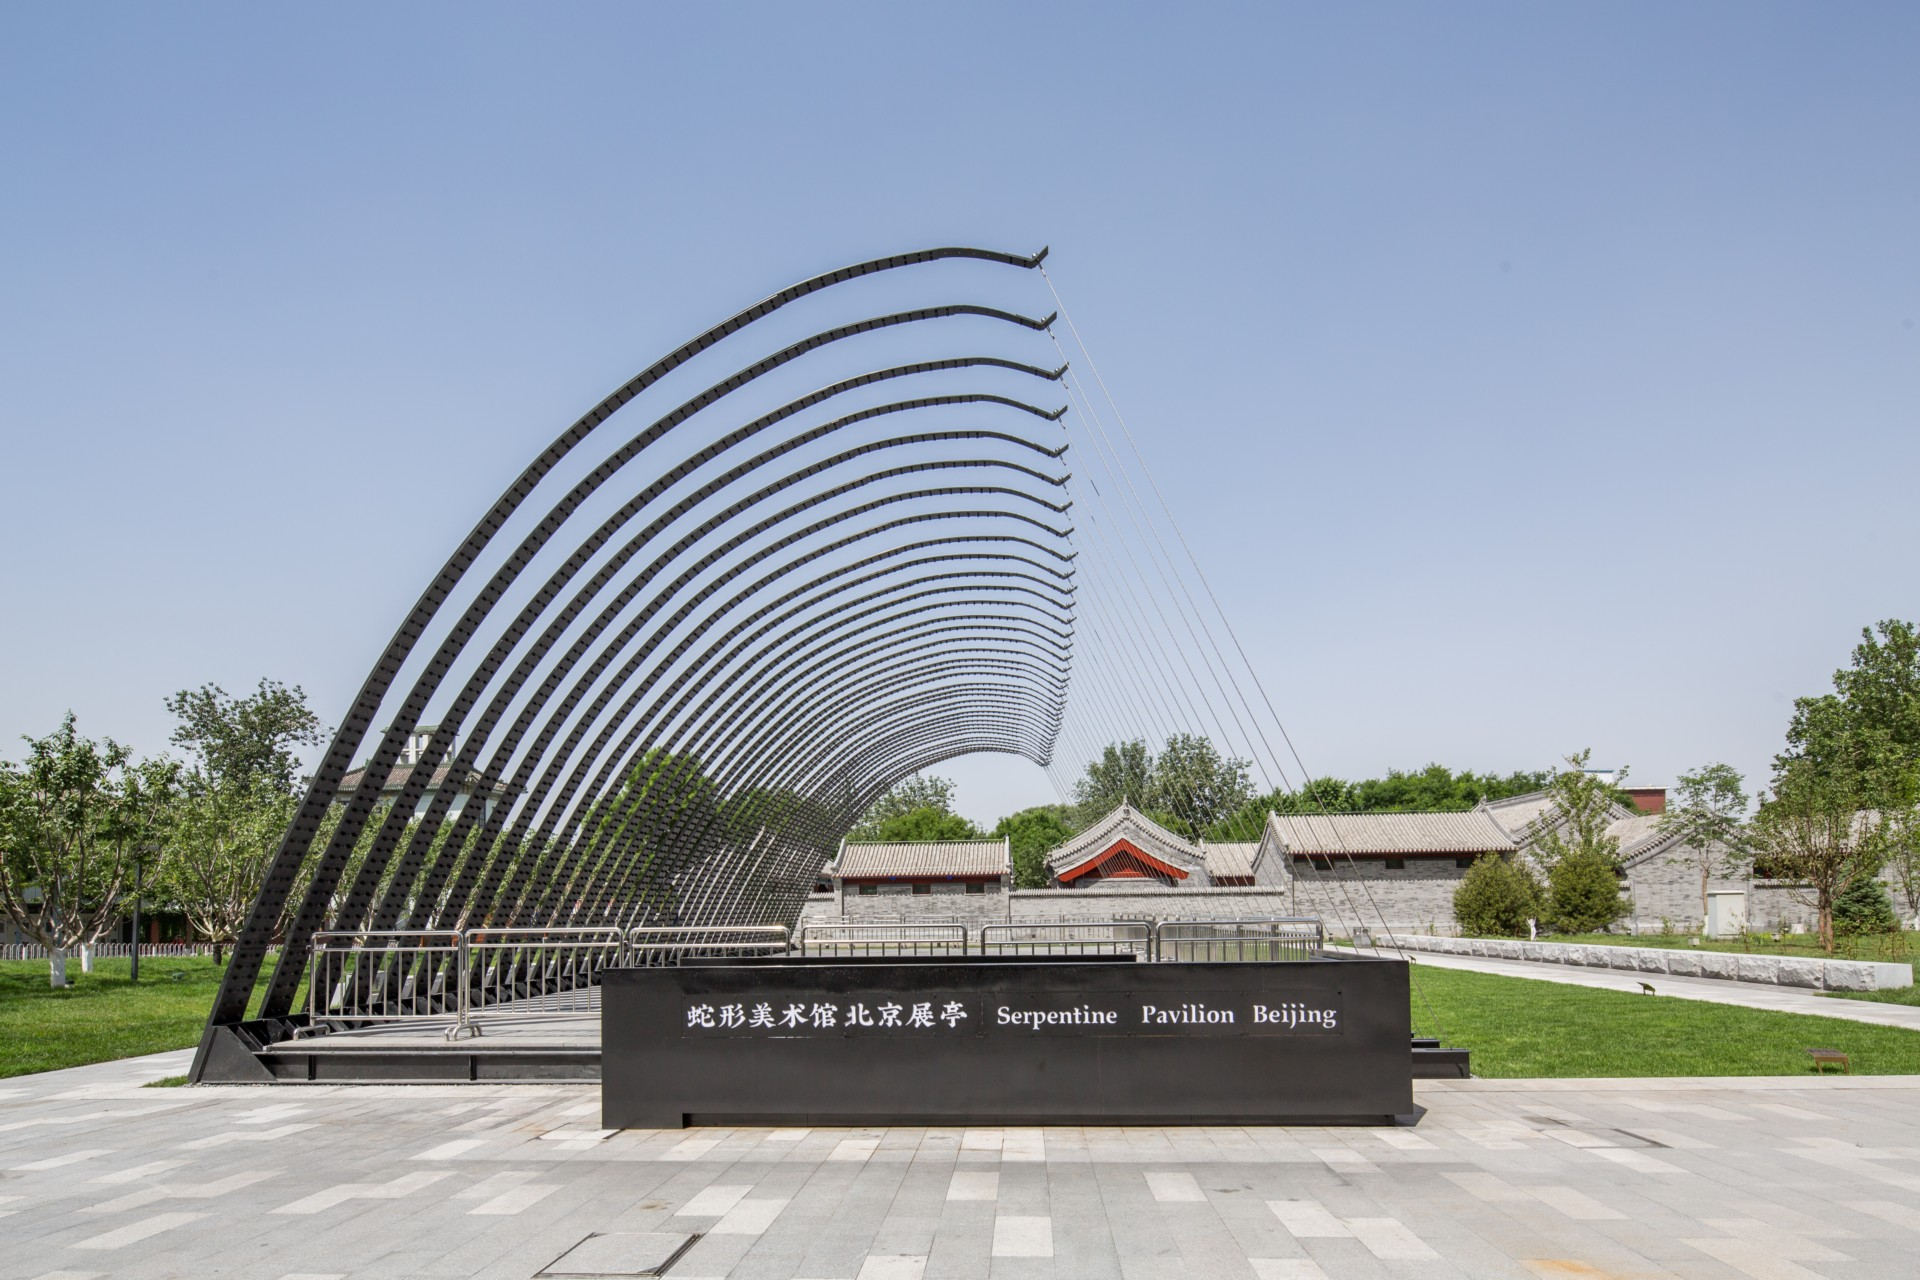 Jiakun Architects premier Serpentine Pavilion Beijing